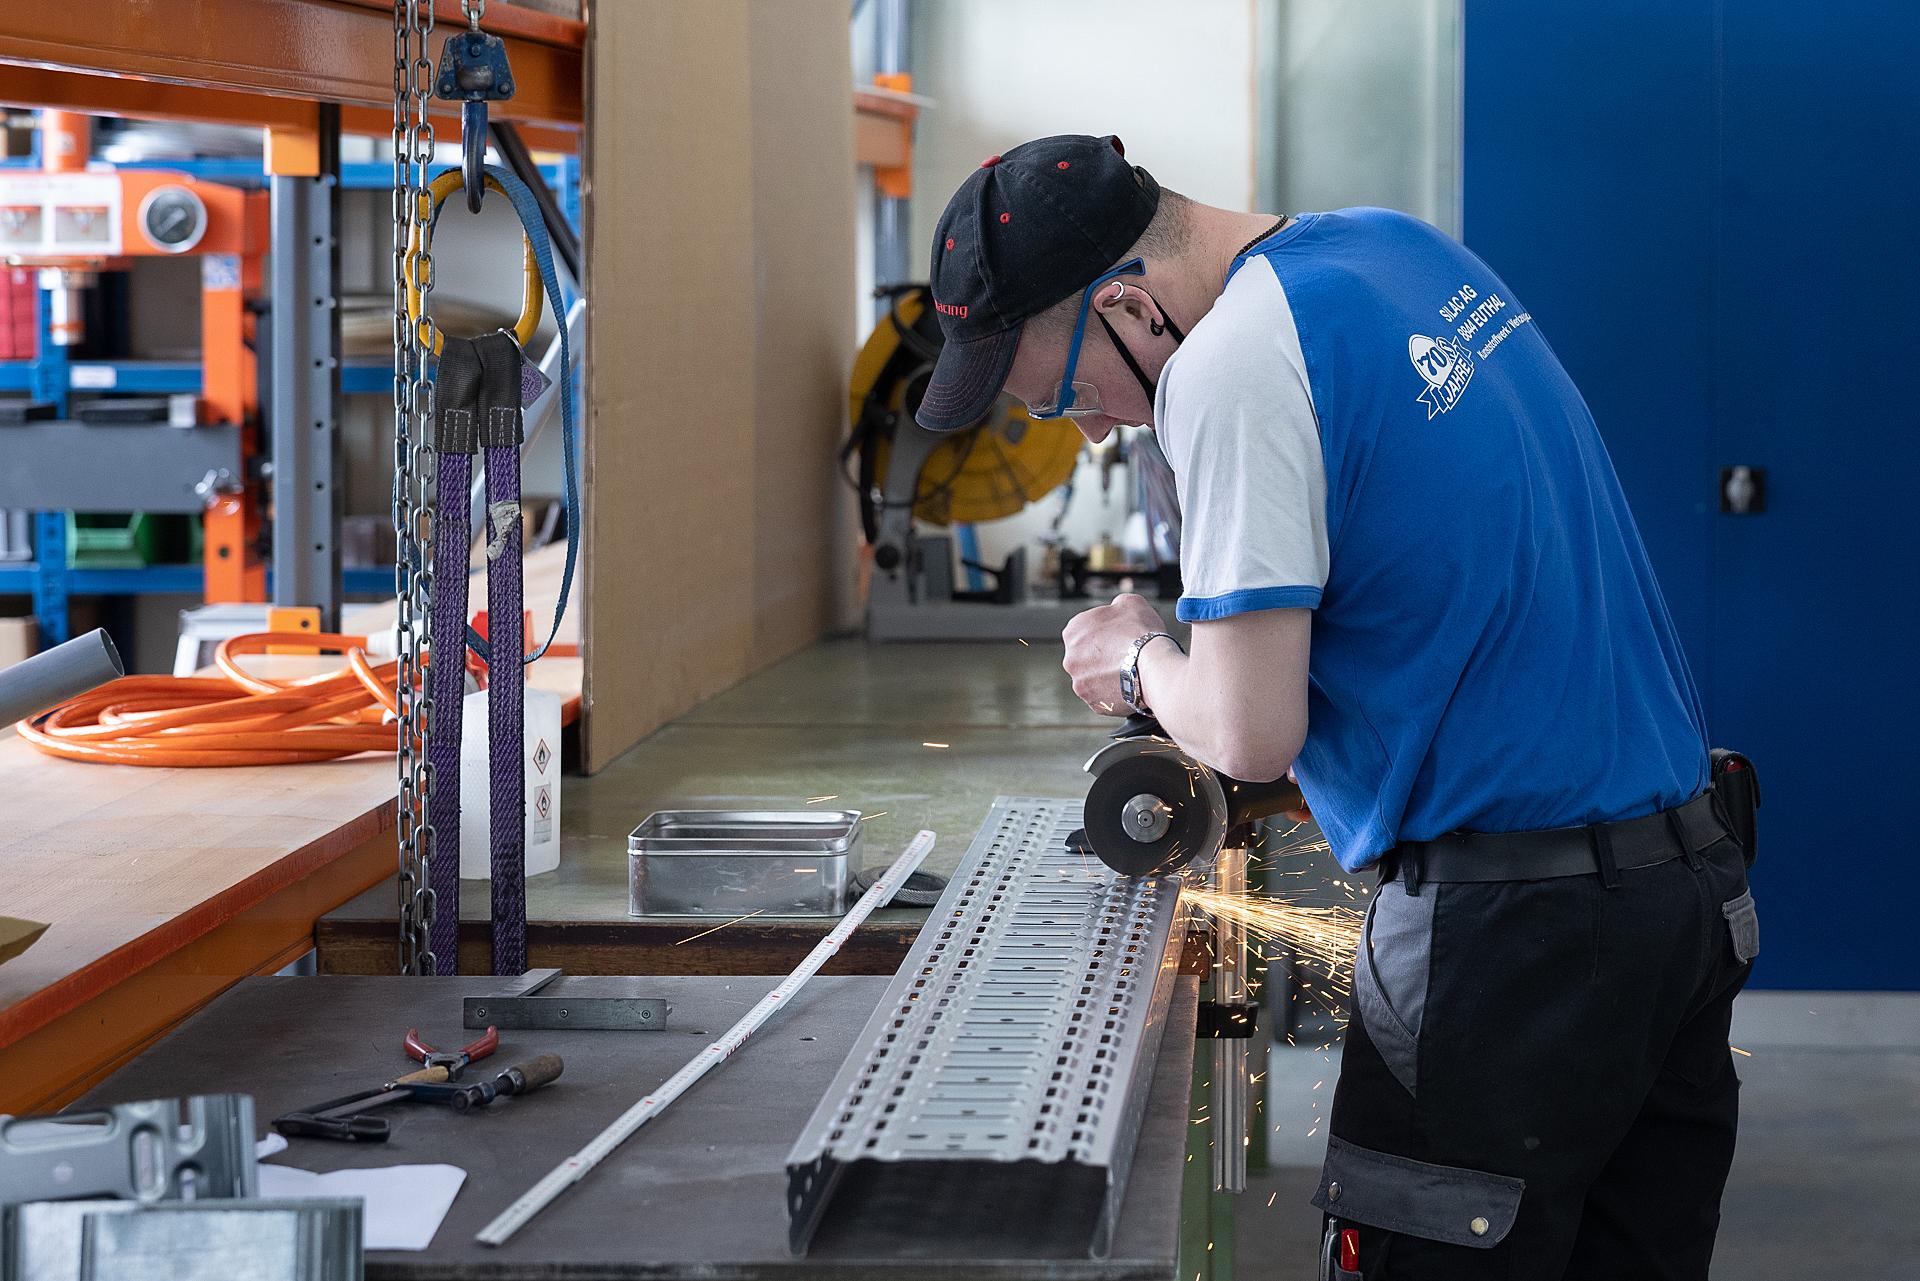 Silac innovative Kunststoff-Loesungen fuer Baubranchen